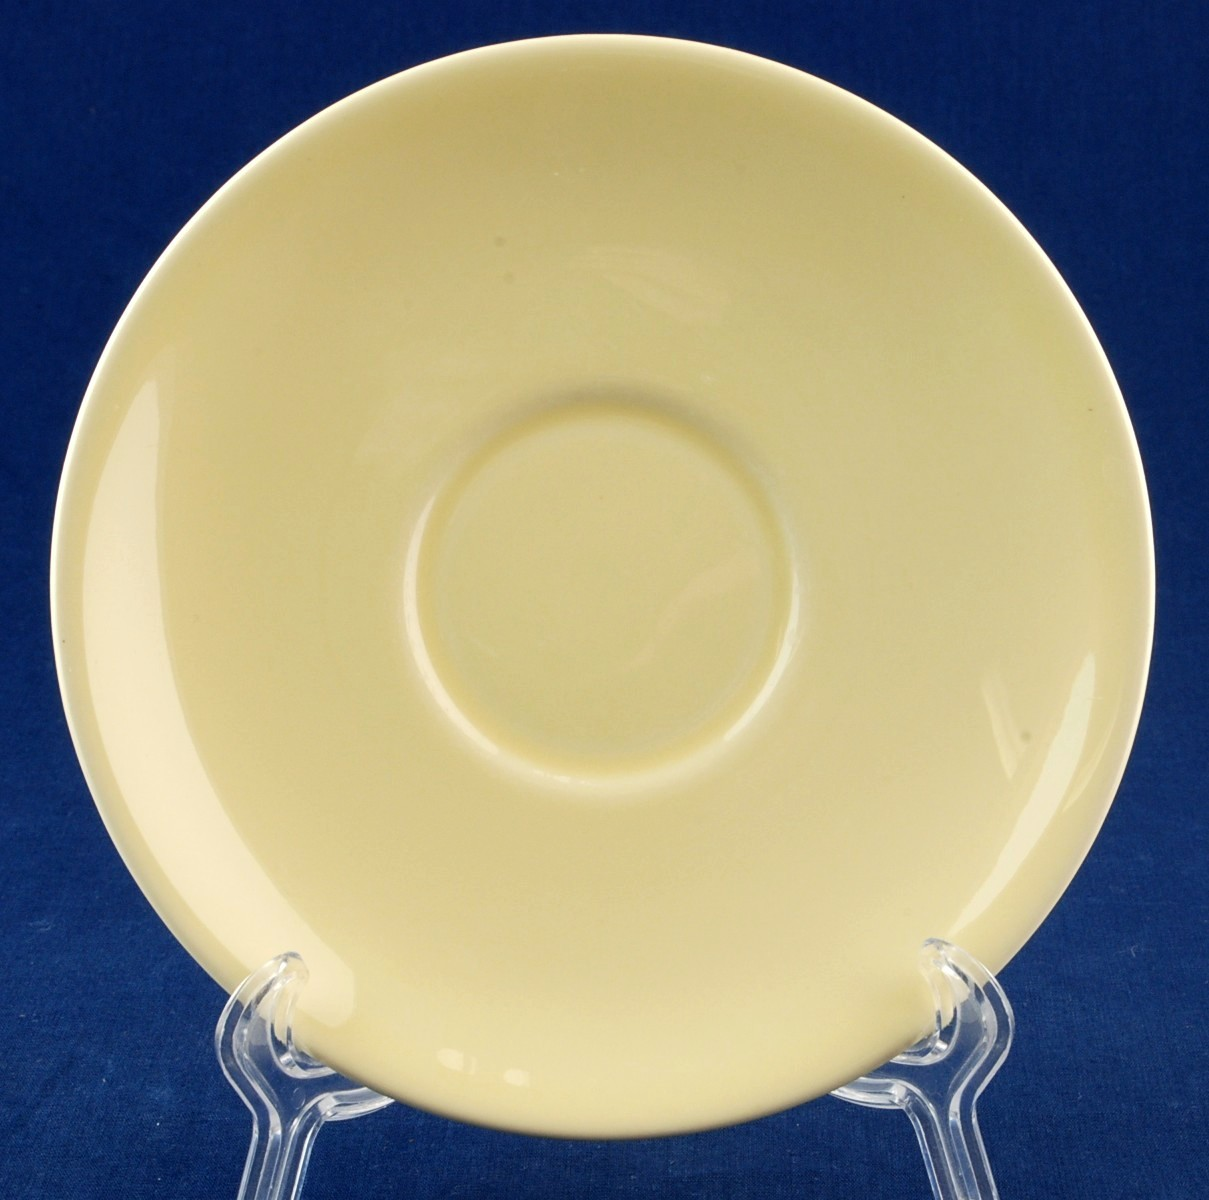 Luray Lu-Ray Pastels Yellow Saucer Taylor Smith TS&T 1049 4501